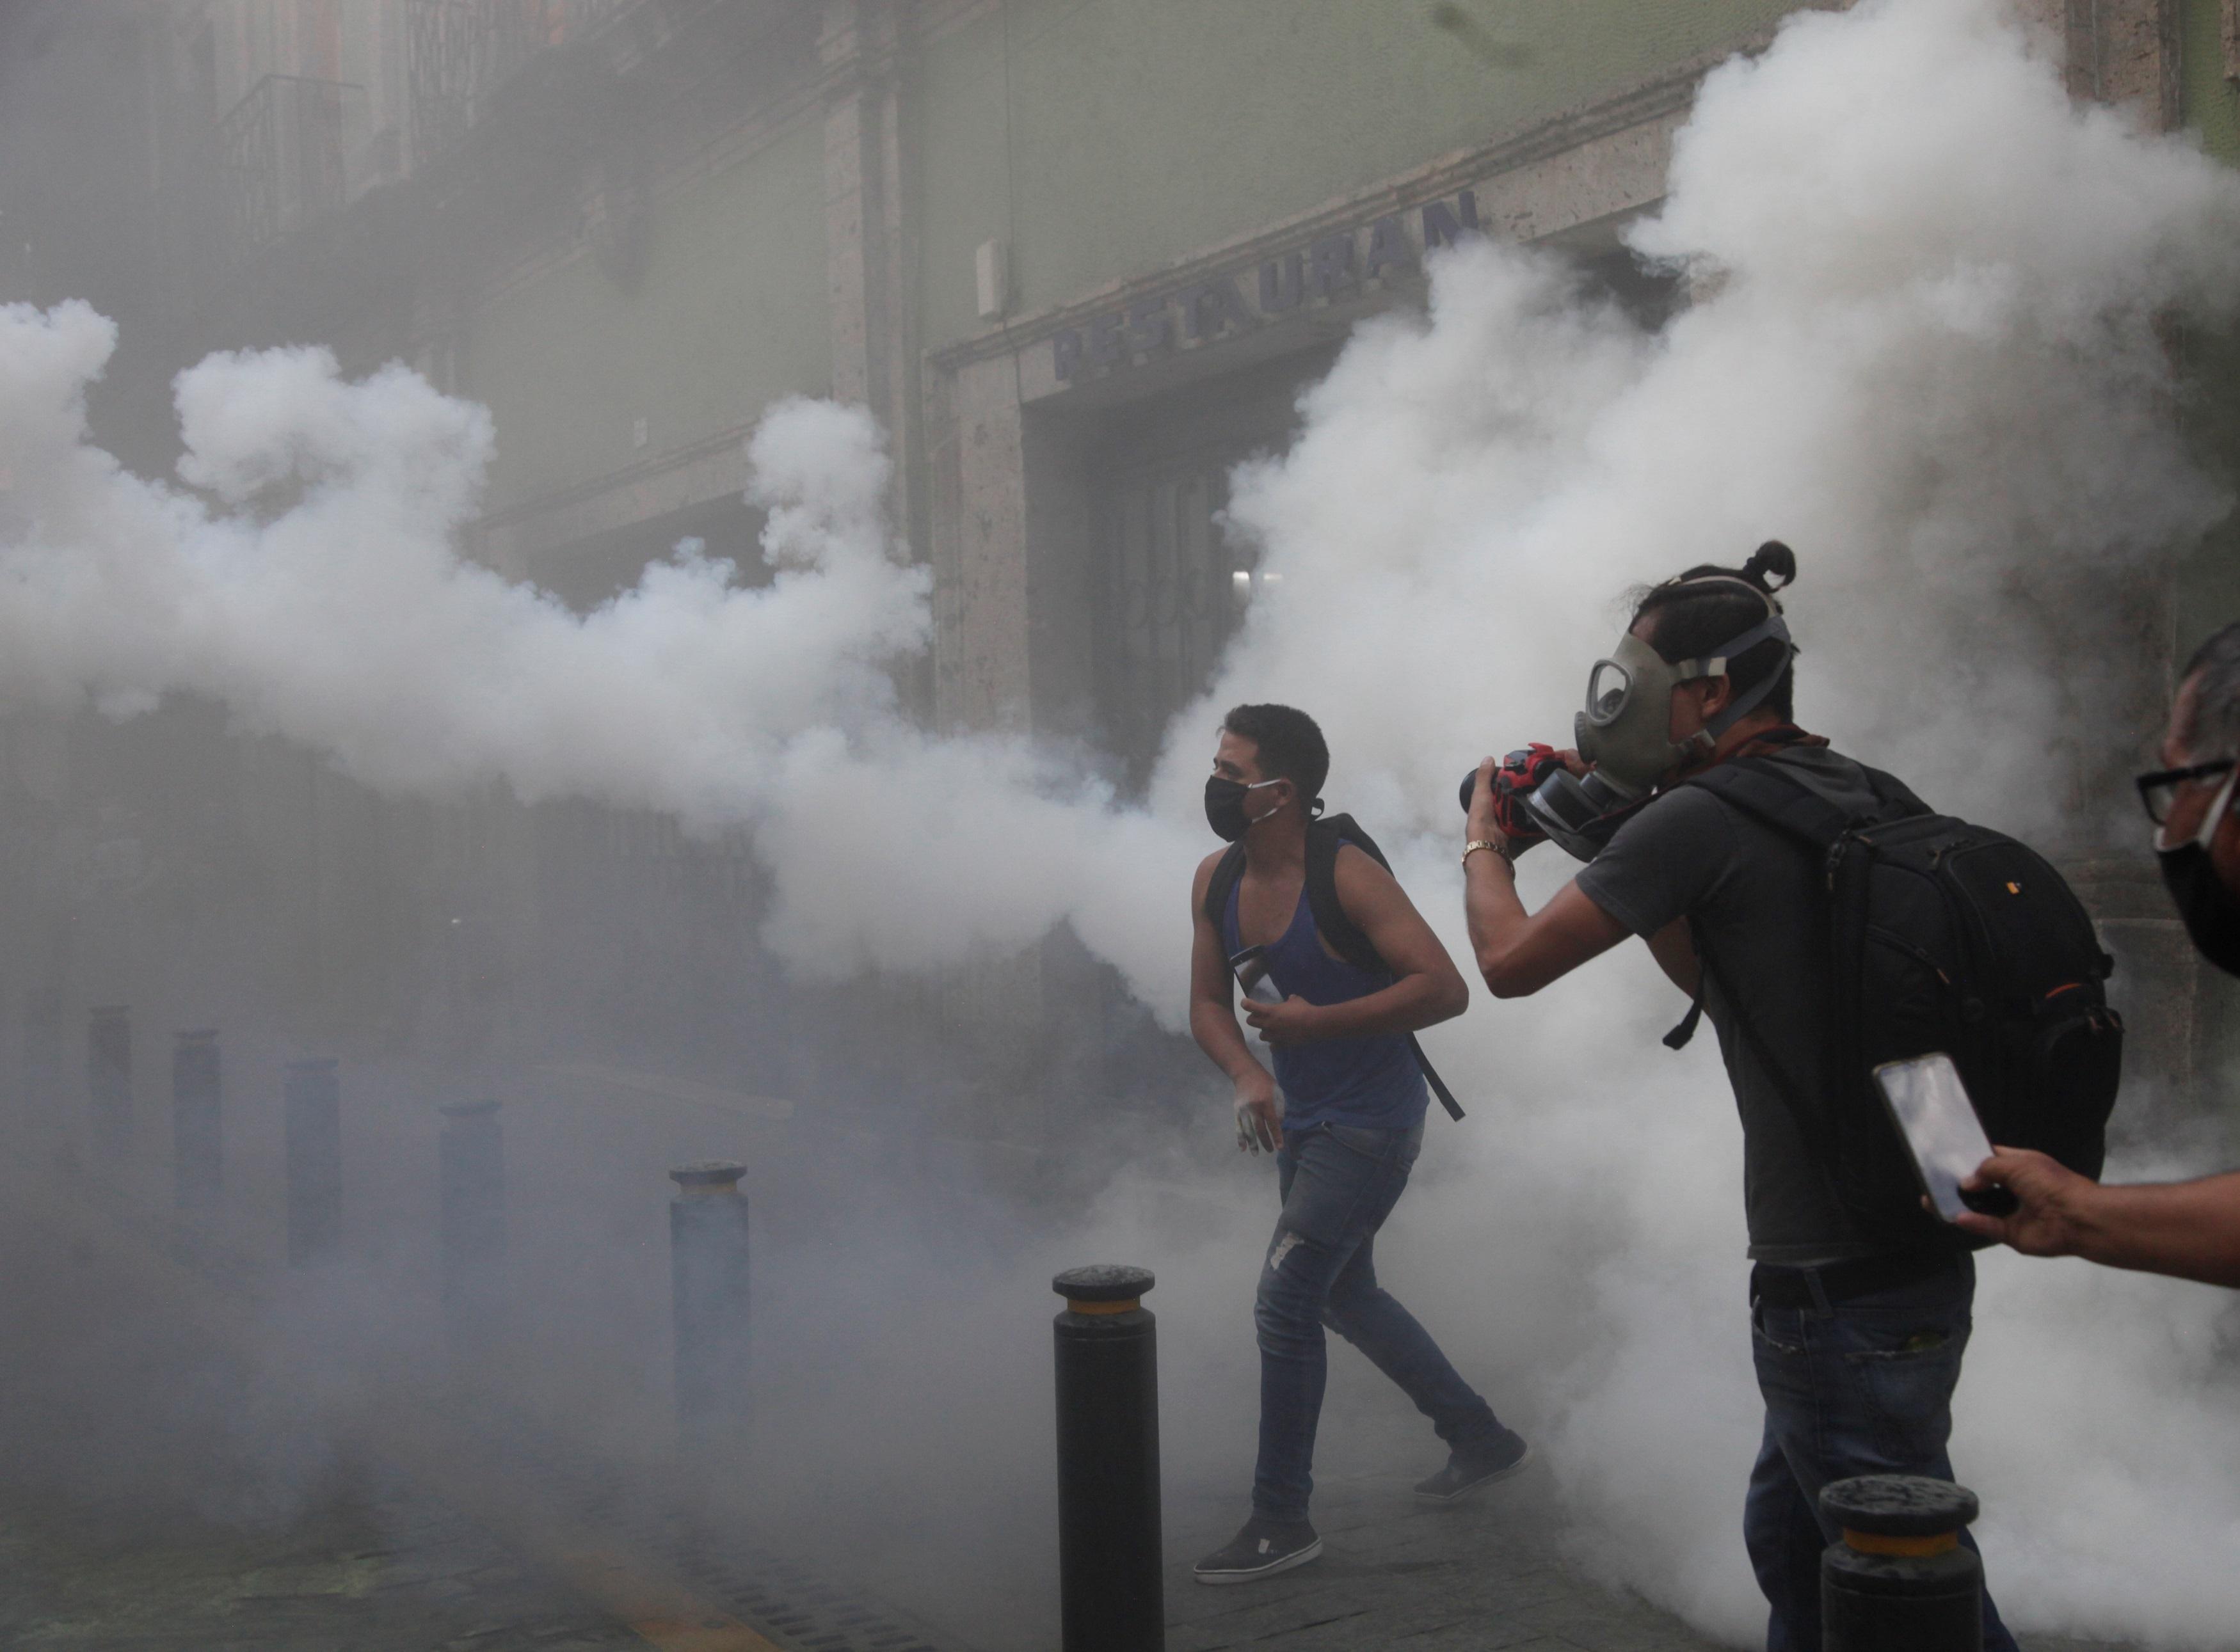 Denuncian desaparición de detenidos en protestas contra policías en México